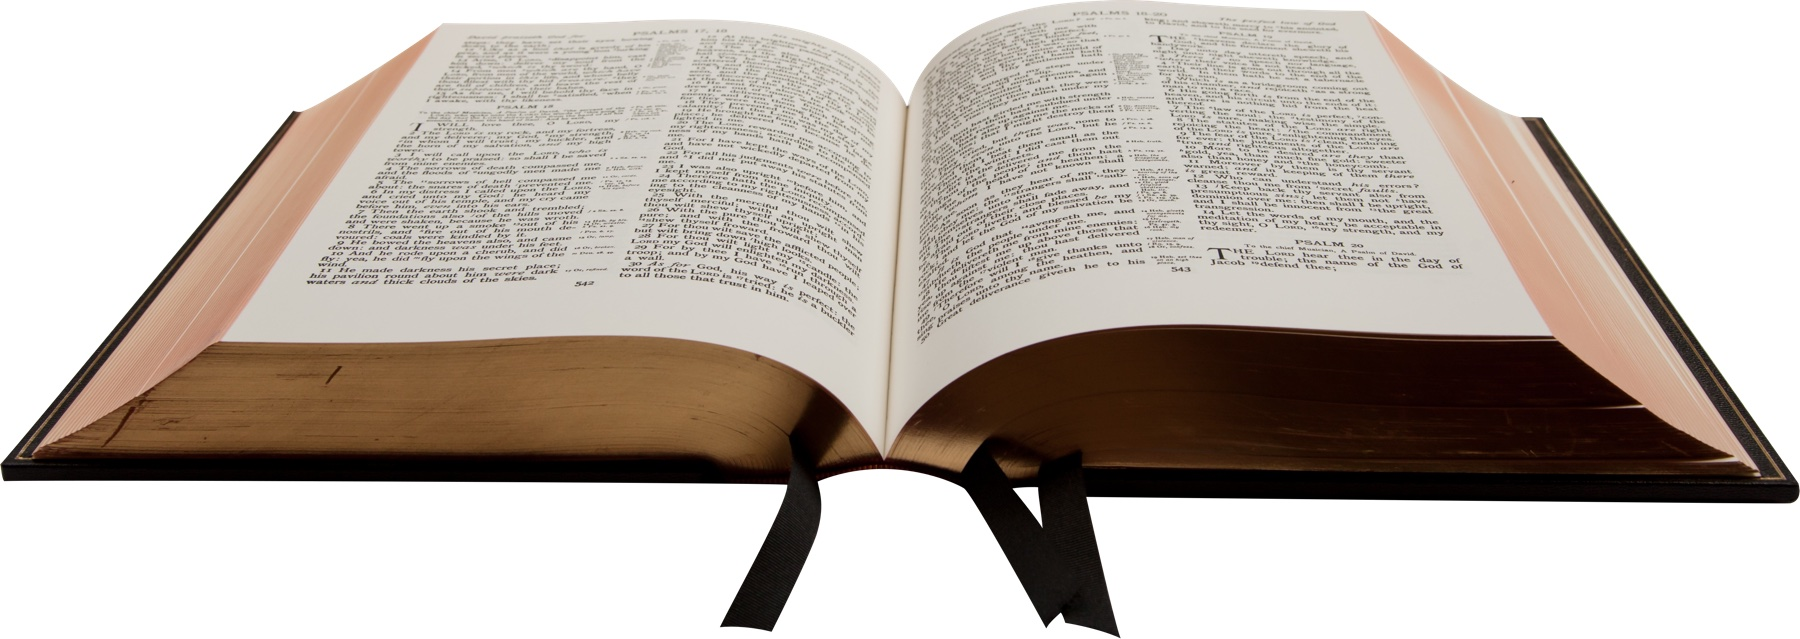 bible-1108074